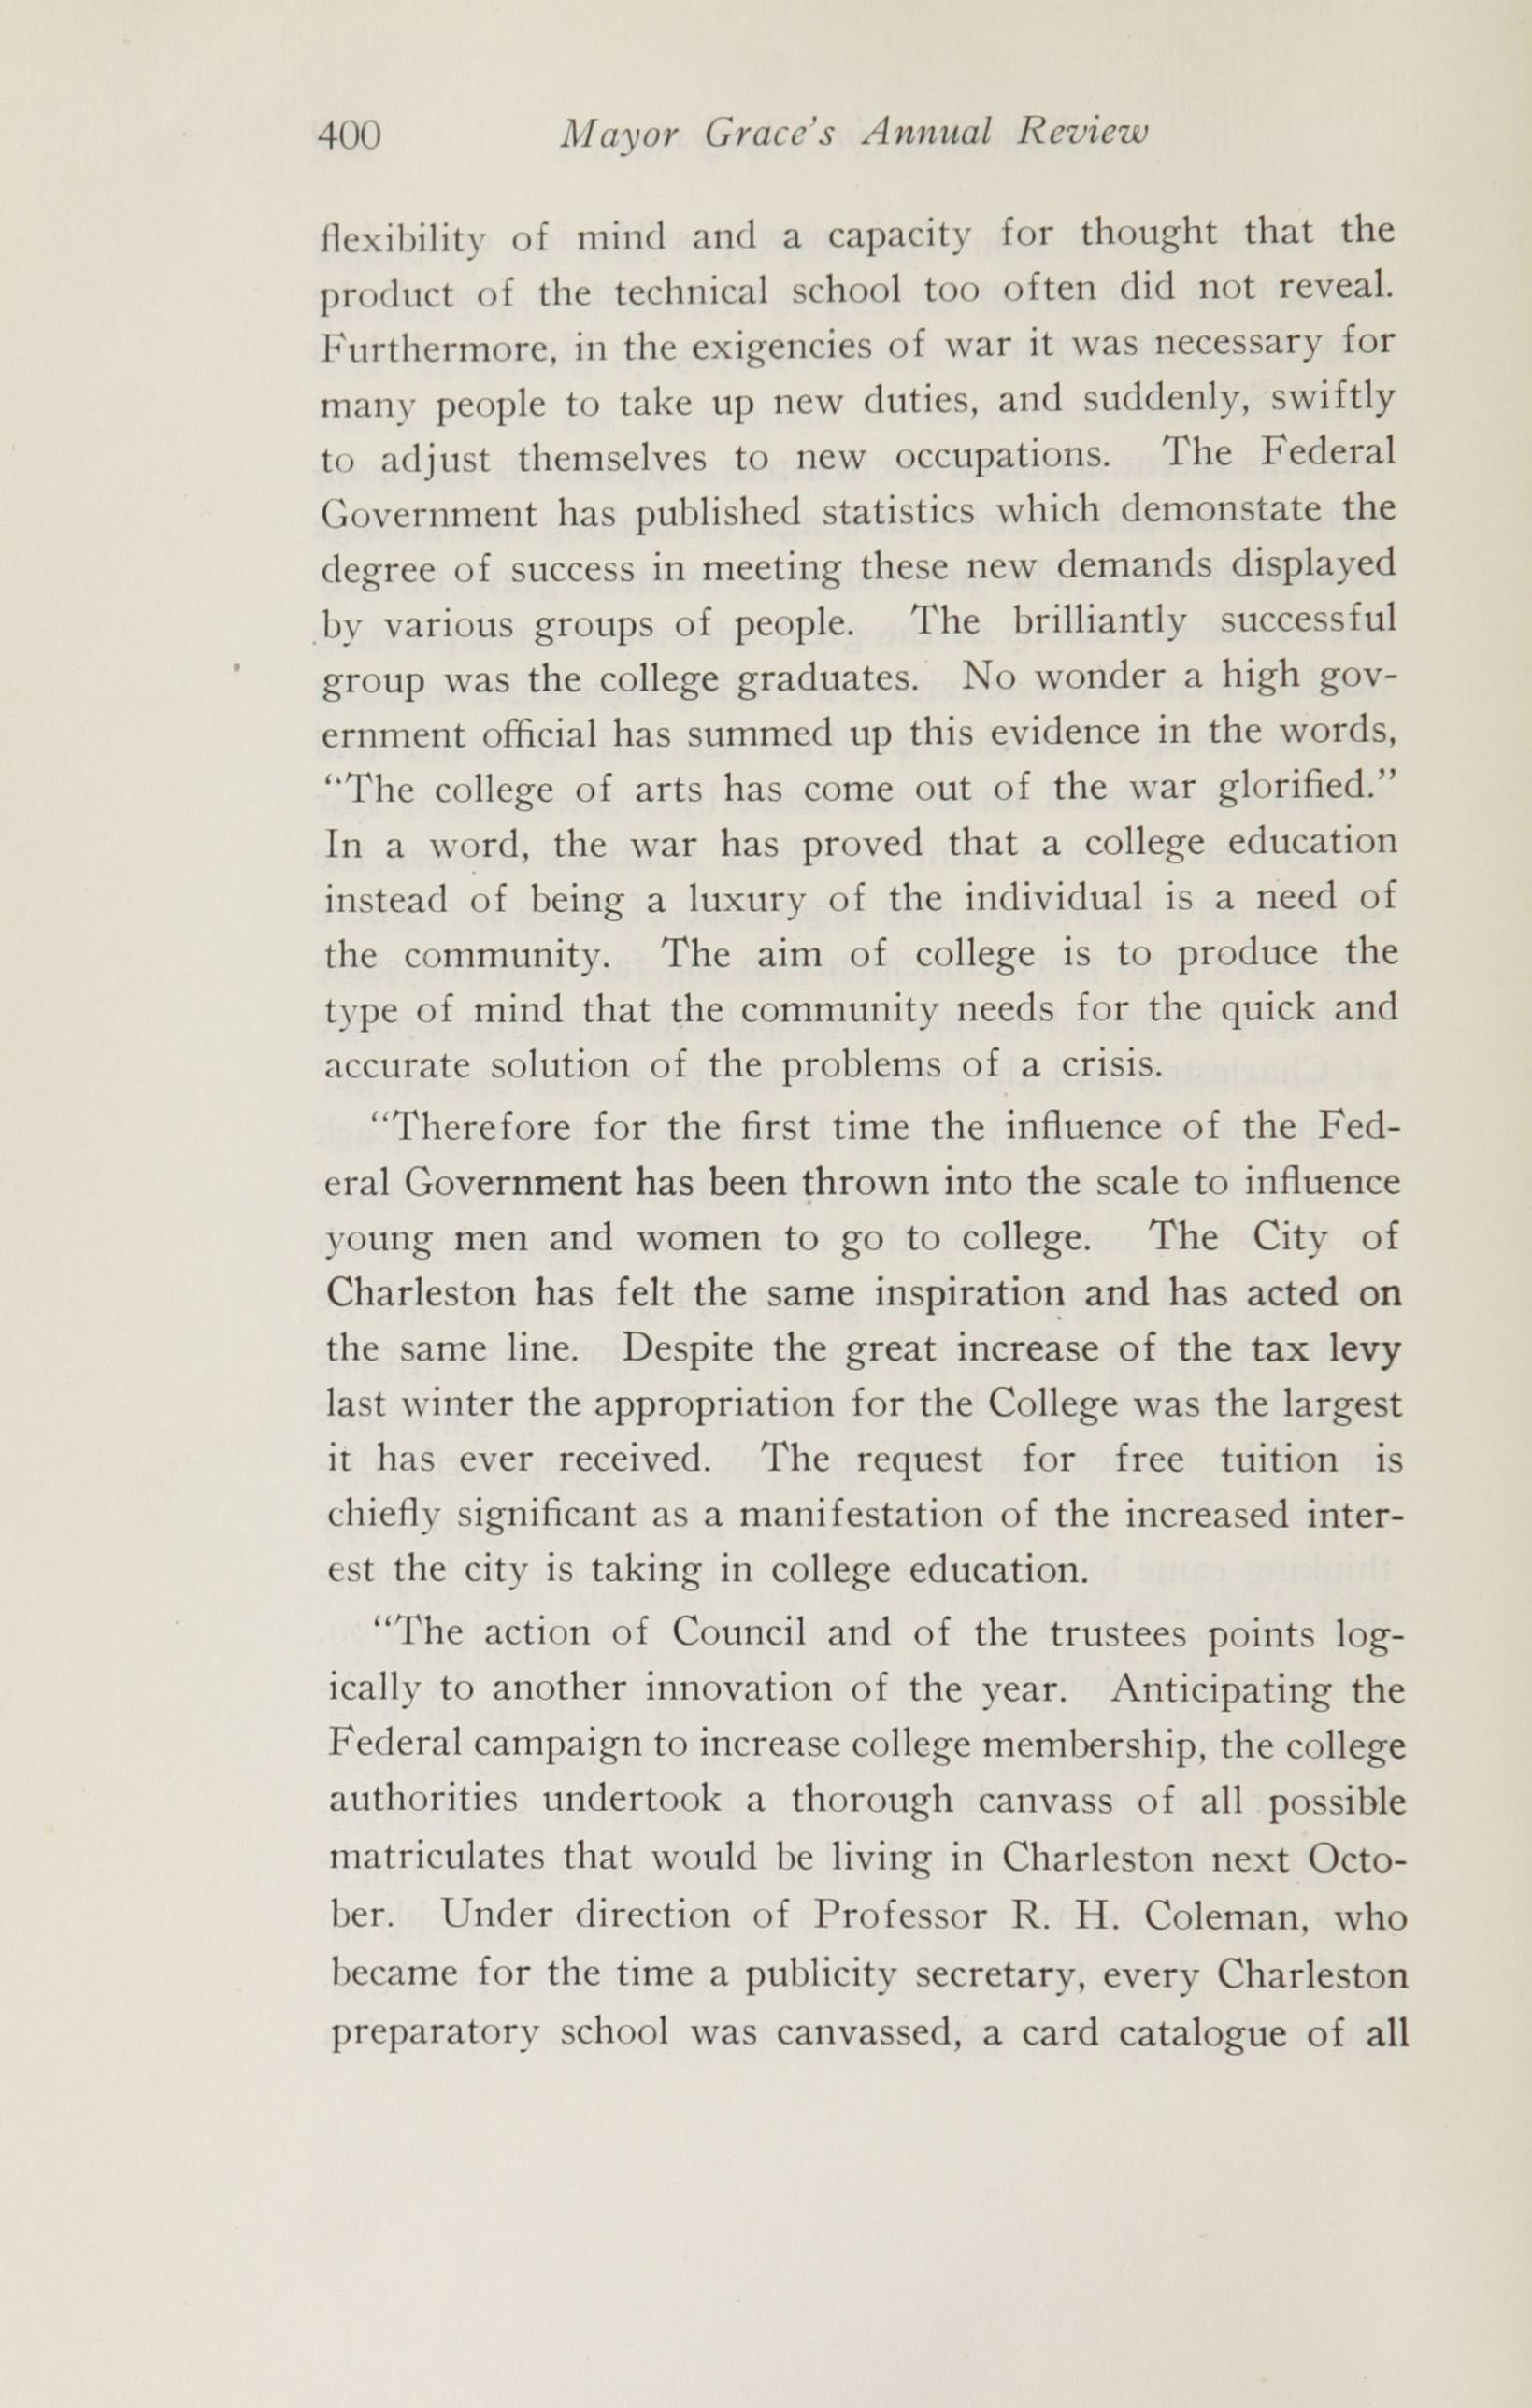 Charleston Yearbook, 1920, page 400